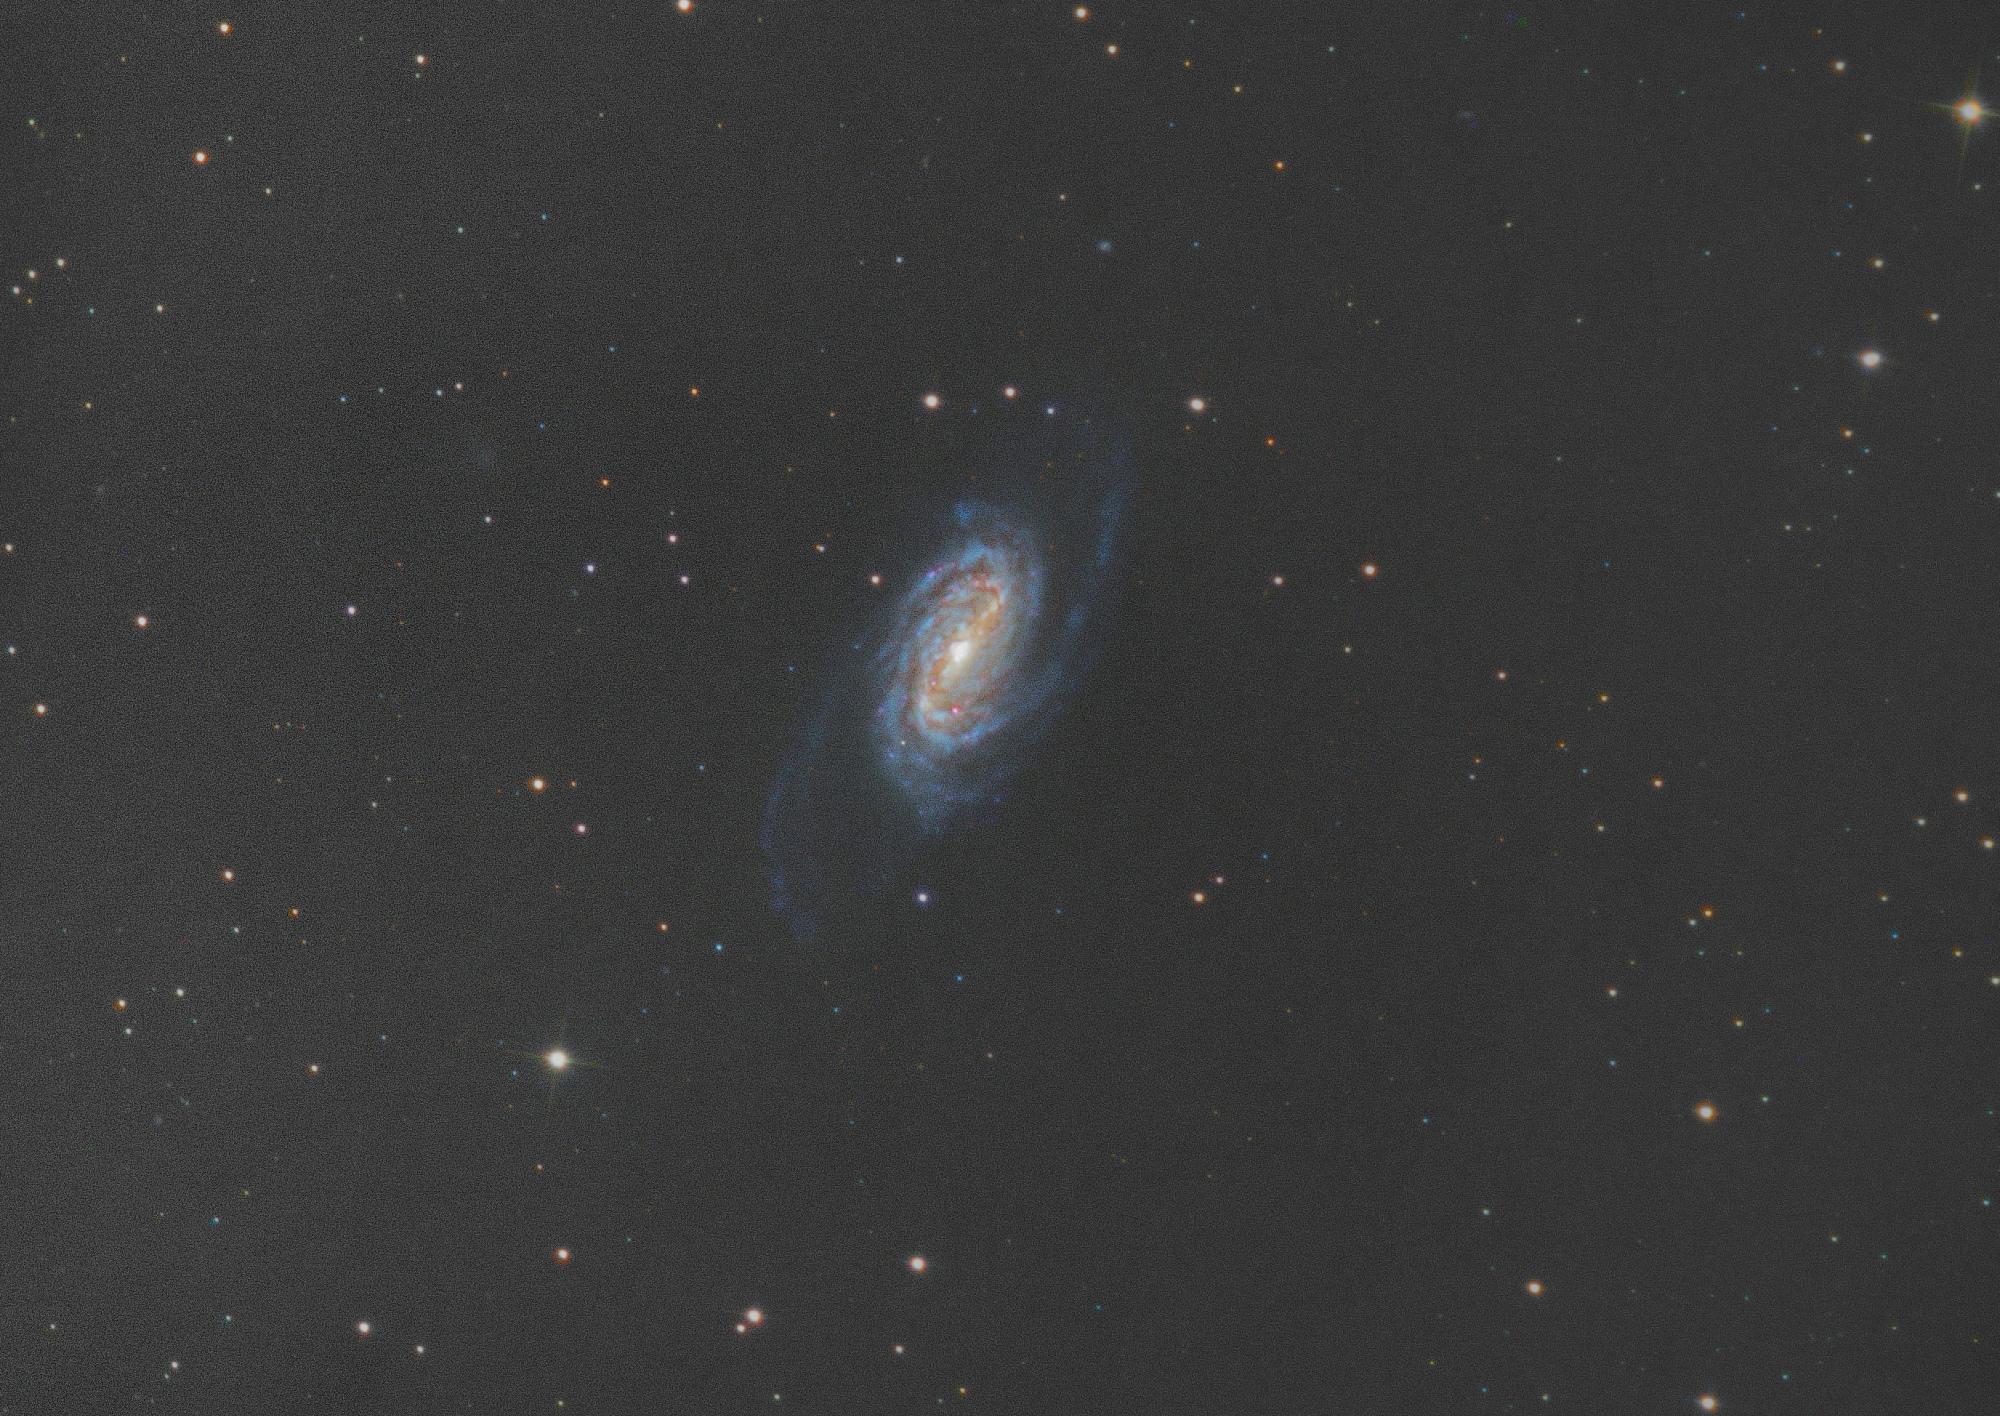 NGC_2903V3.thumb.jpg.9062992d7f0958aaa216ed55166d7044.jpg